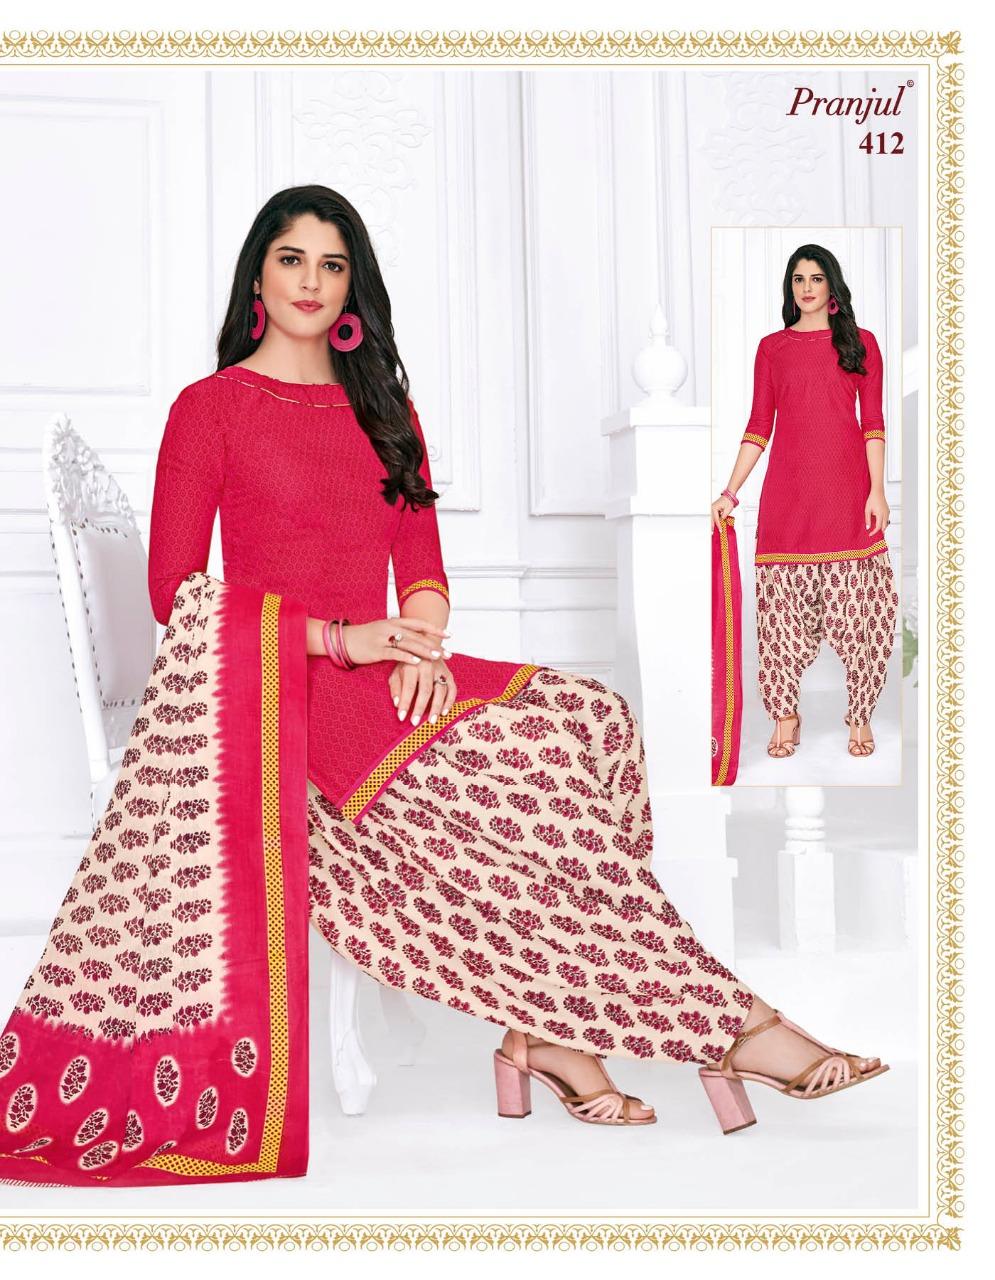 Pranjul Priyanka Vol 4 A Readymade Suit Wholesale Catalog 15 Pcs 16 - Pranjul Priyanka Vol 4 A Readymade Suit Wholesale Catalog 15 Pcs